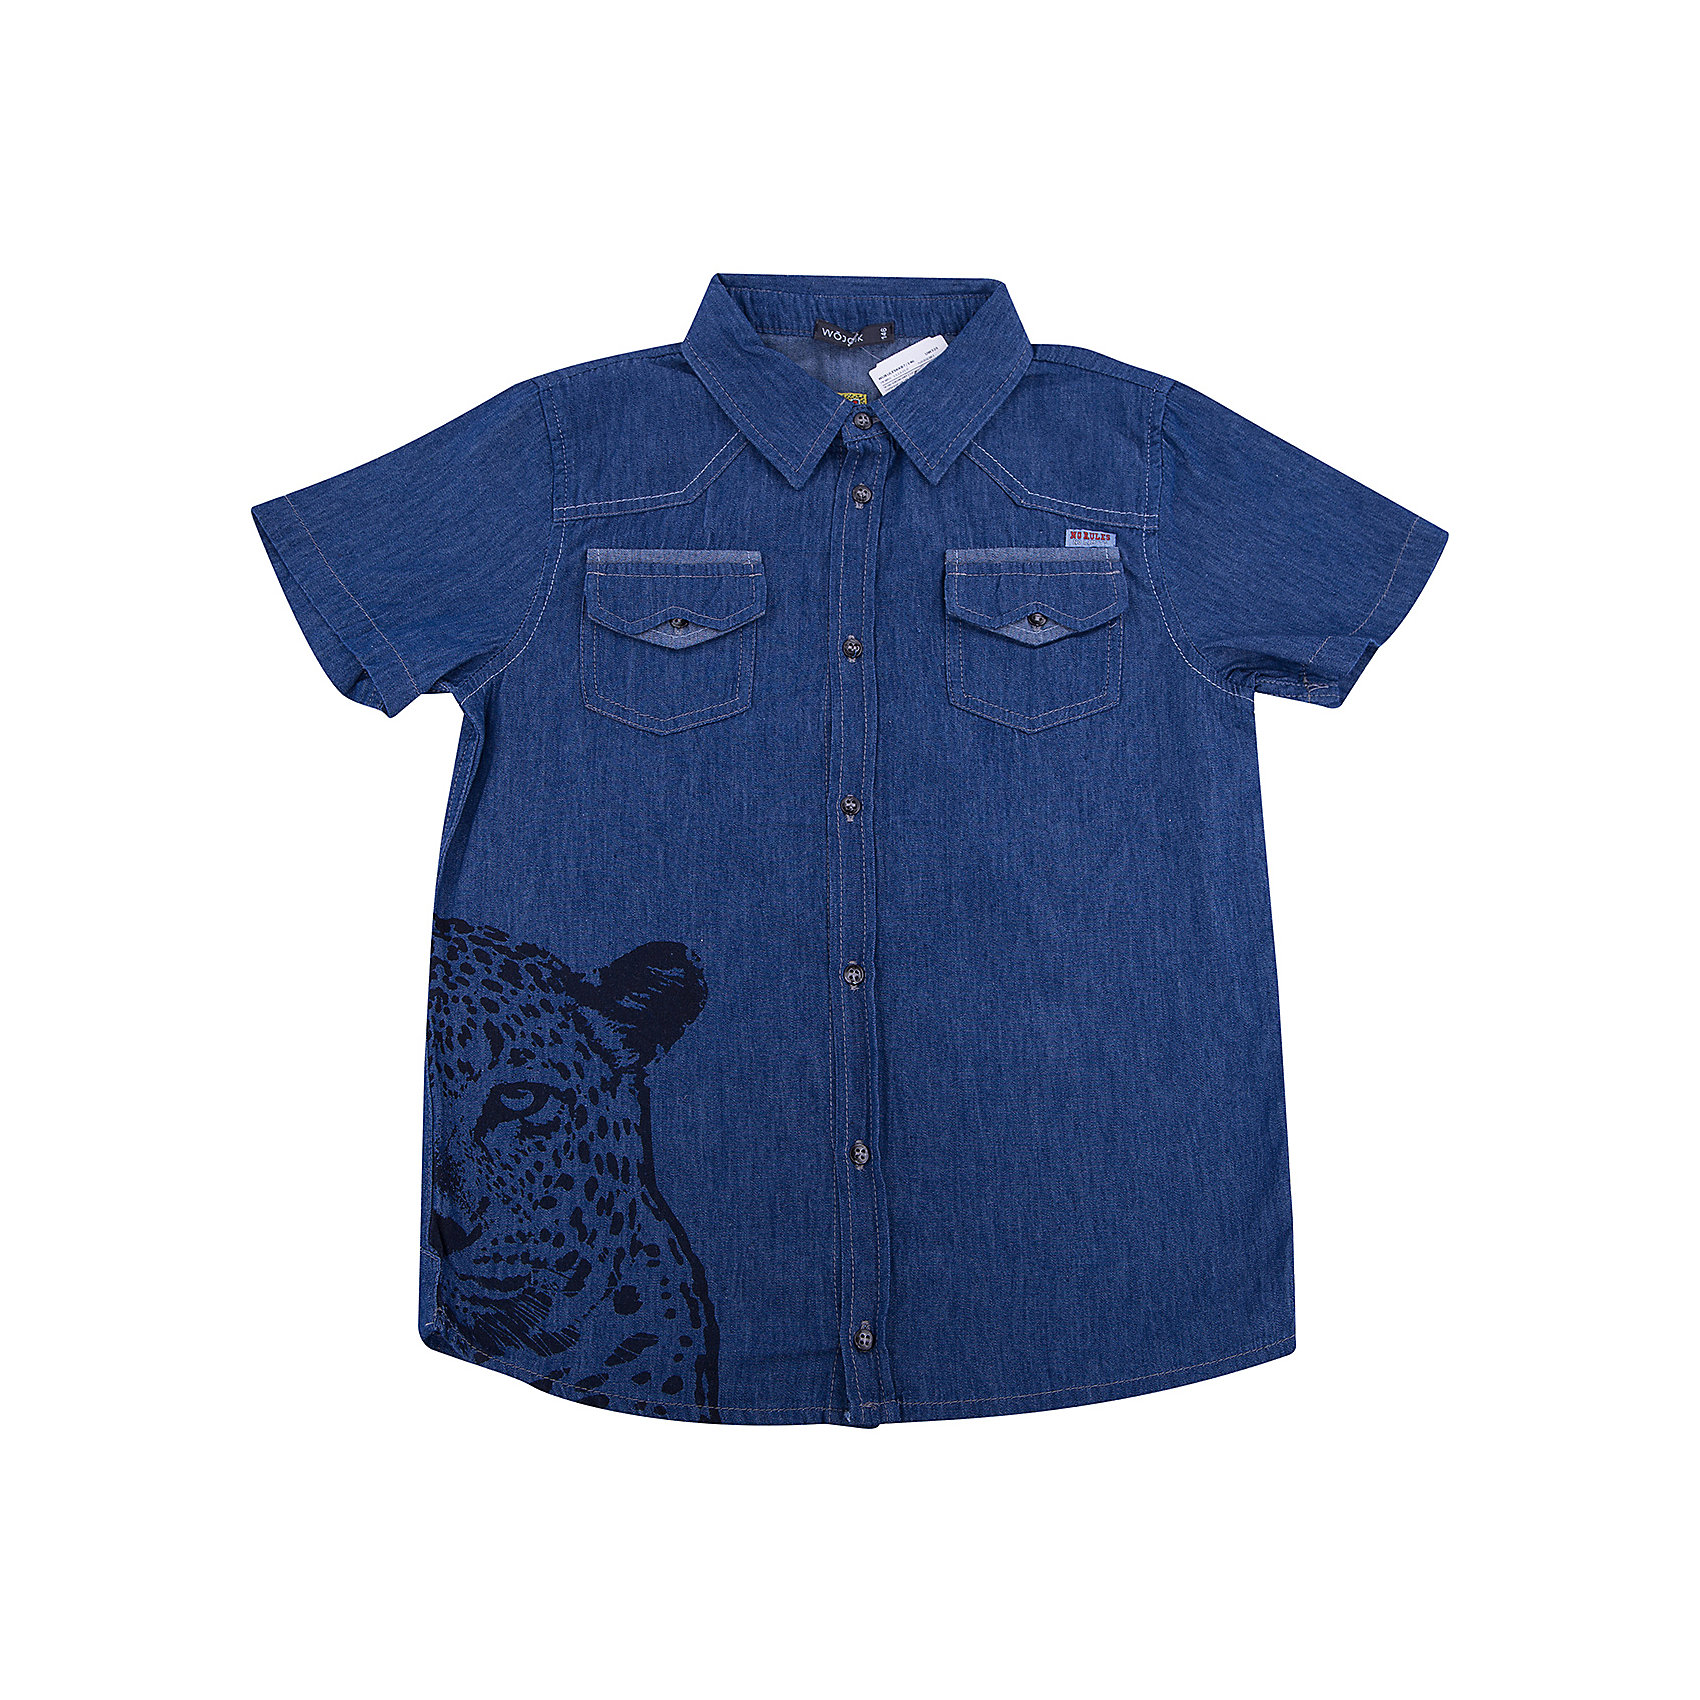 Рубашка для мальчика WojcikБлузки и рубашки<br>Рубашка для мальчика Wojcik<br>Состав:<br>Хлопок 100%<br><br>Ширина мм: 174<br>Глубина мм: 10<br>Высота мм: 169<br>Вес г: 157<br>Цвет: синий<br>Возраст от месяцев: 120<br>Возраст до месяцев: 132<br>Пол: Мужской<br>Возраст: Детский<br>Размер: 134,146,140,128,122,116,110<br>SKU: 5588793